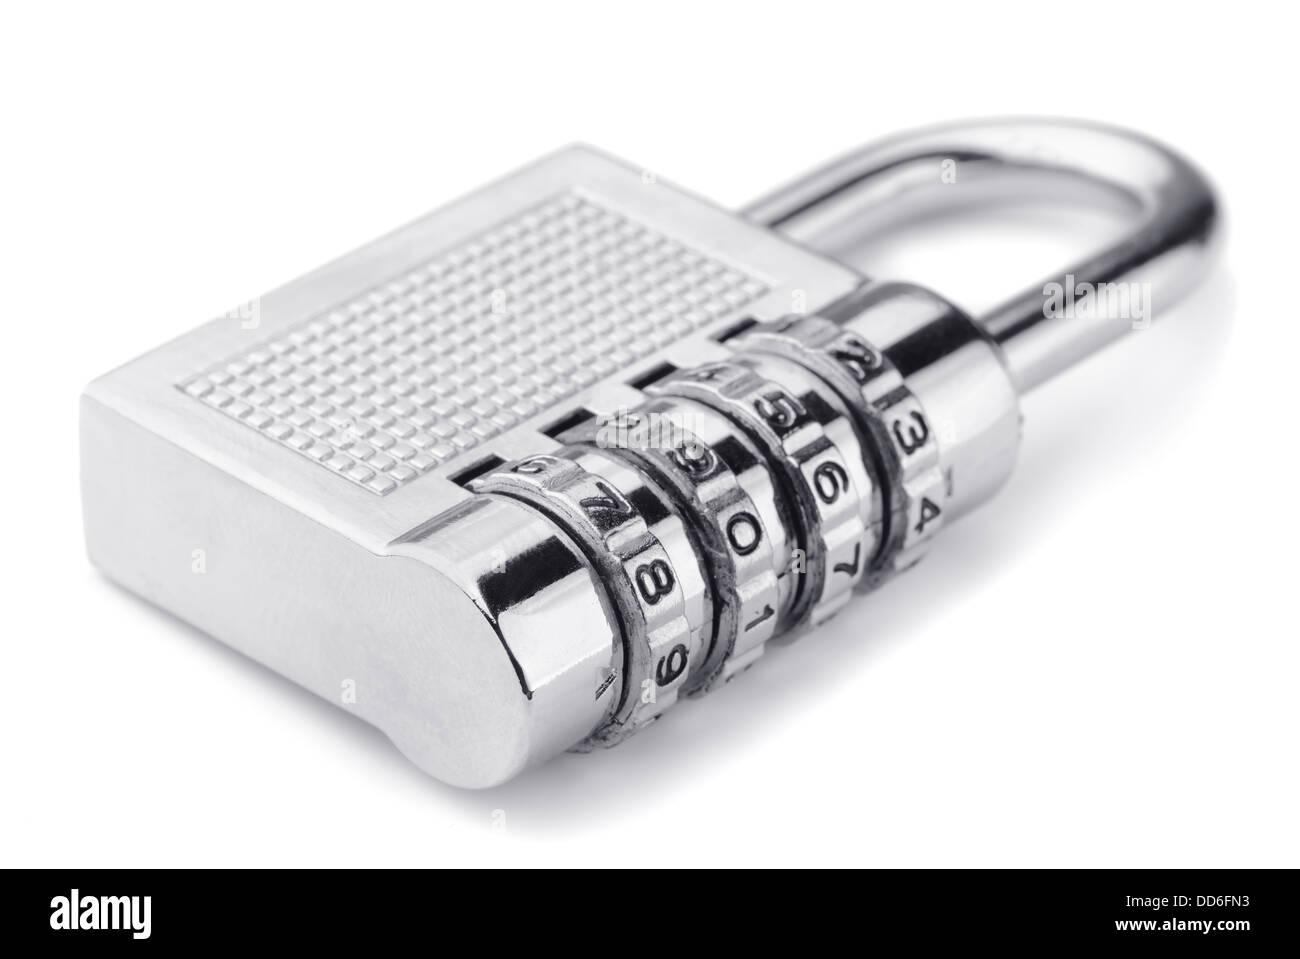 Combination padlock isolated on white - Stock Image